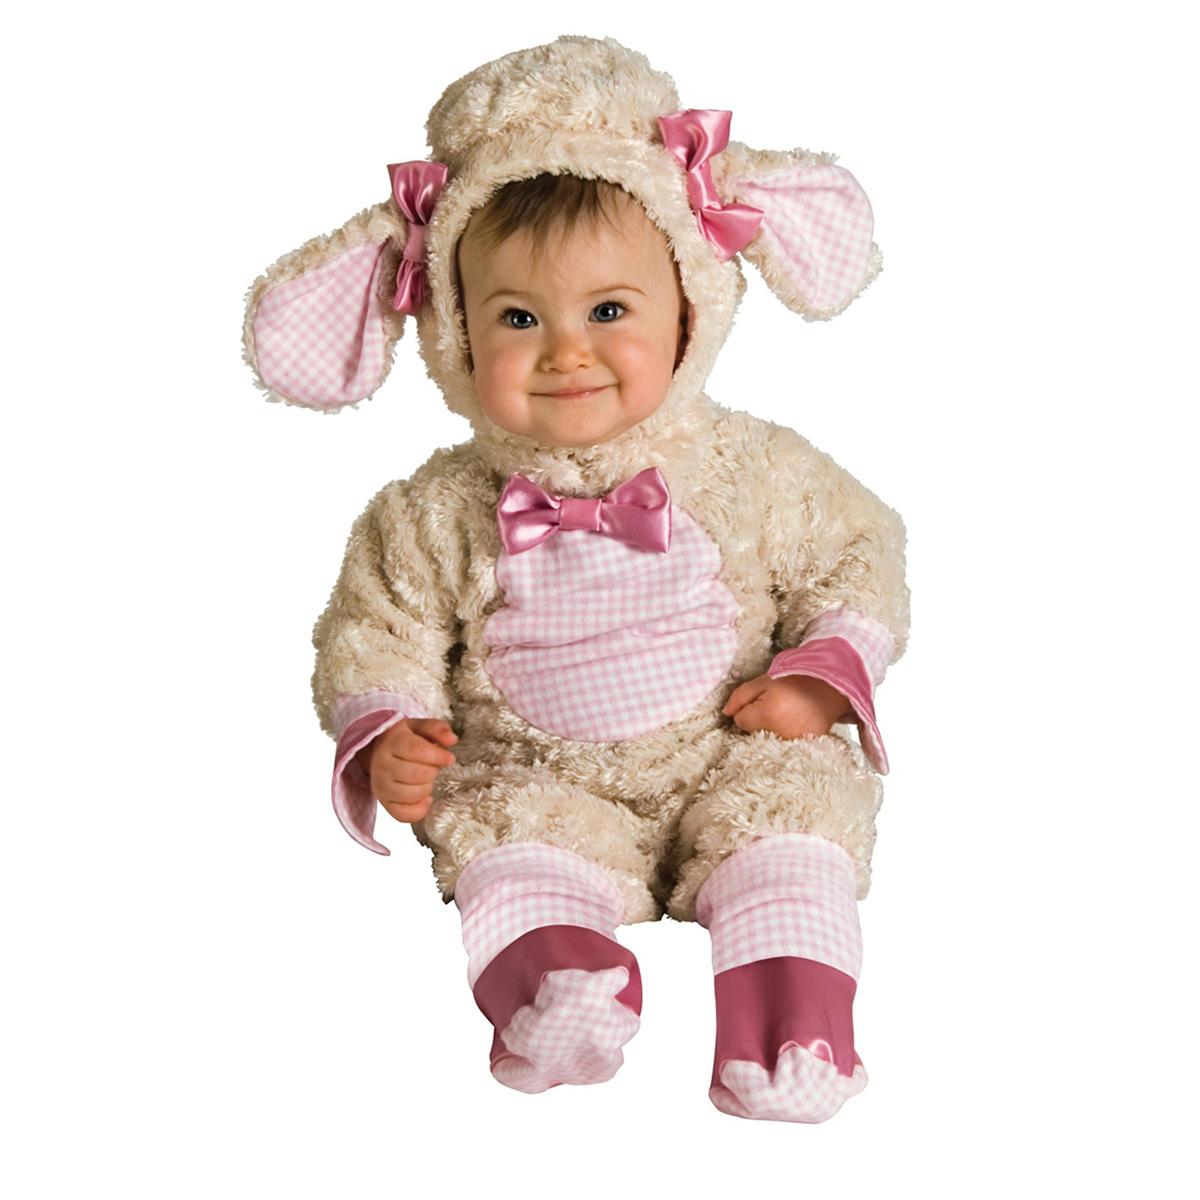 a47dbab2cf2a9 楽天市場 羊 コスチューム ベビー 赤ちゃん 衣装 ピンク ひつじ ...